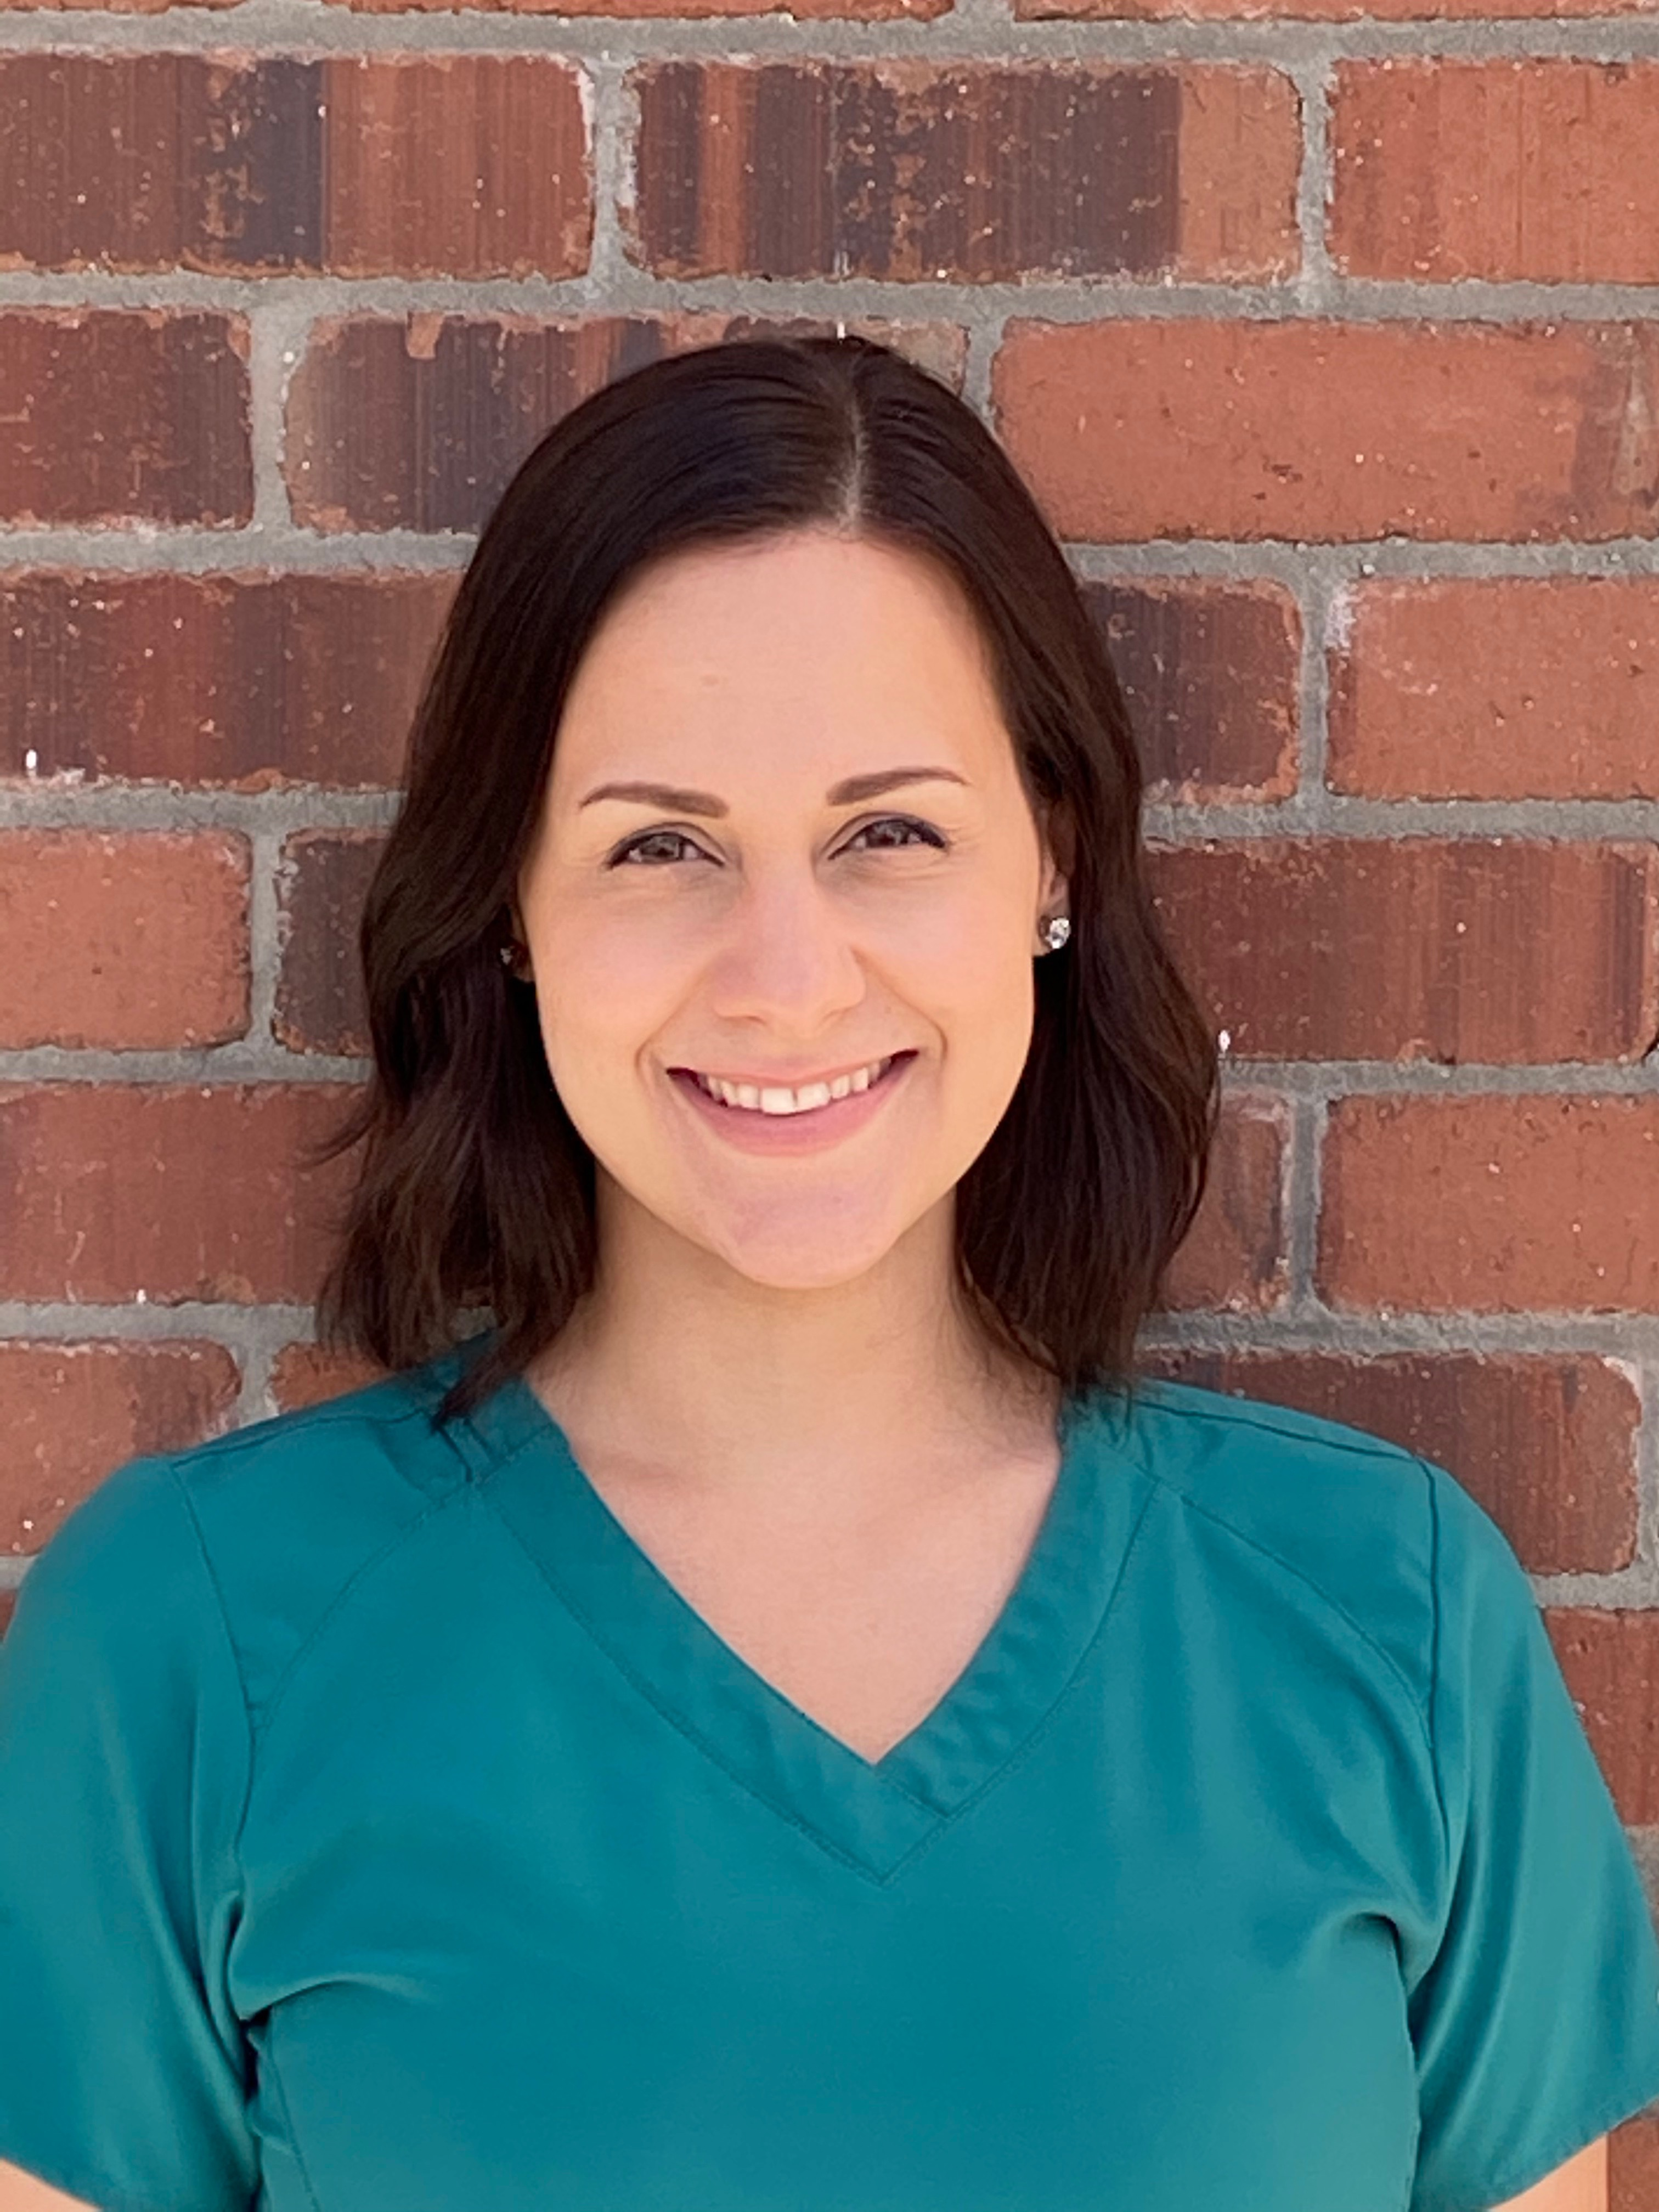 Kelsey - Veterinary Assistant